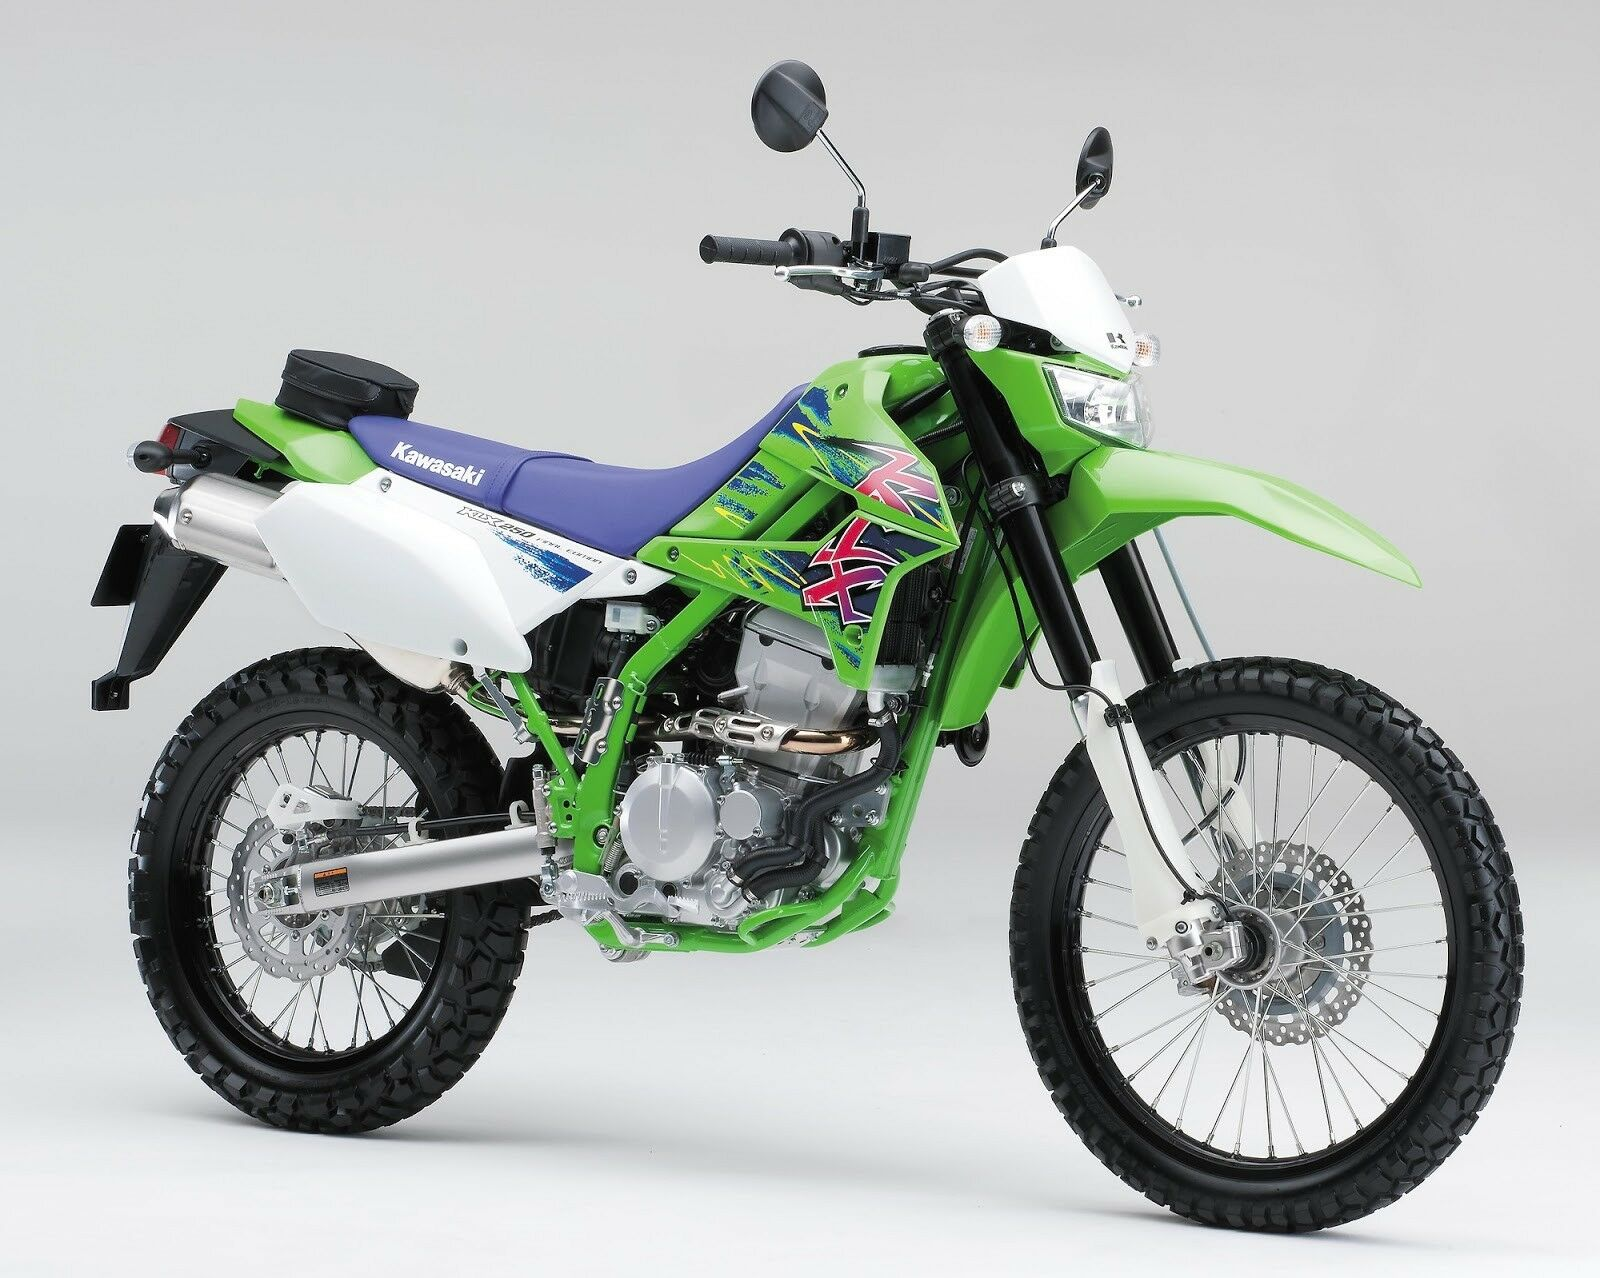 Moto xt531 New Tokyo Kawasaki klx250 final Edition 1   12 United States